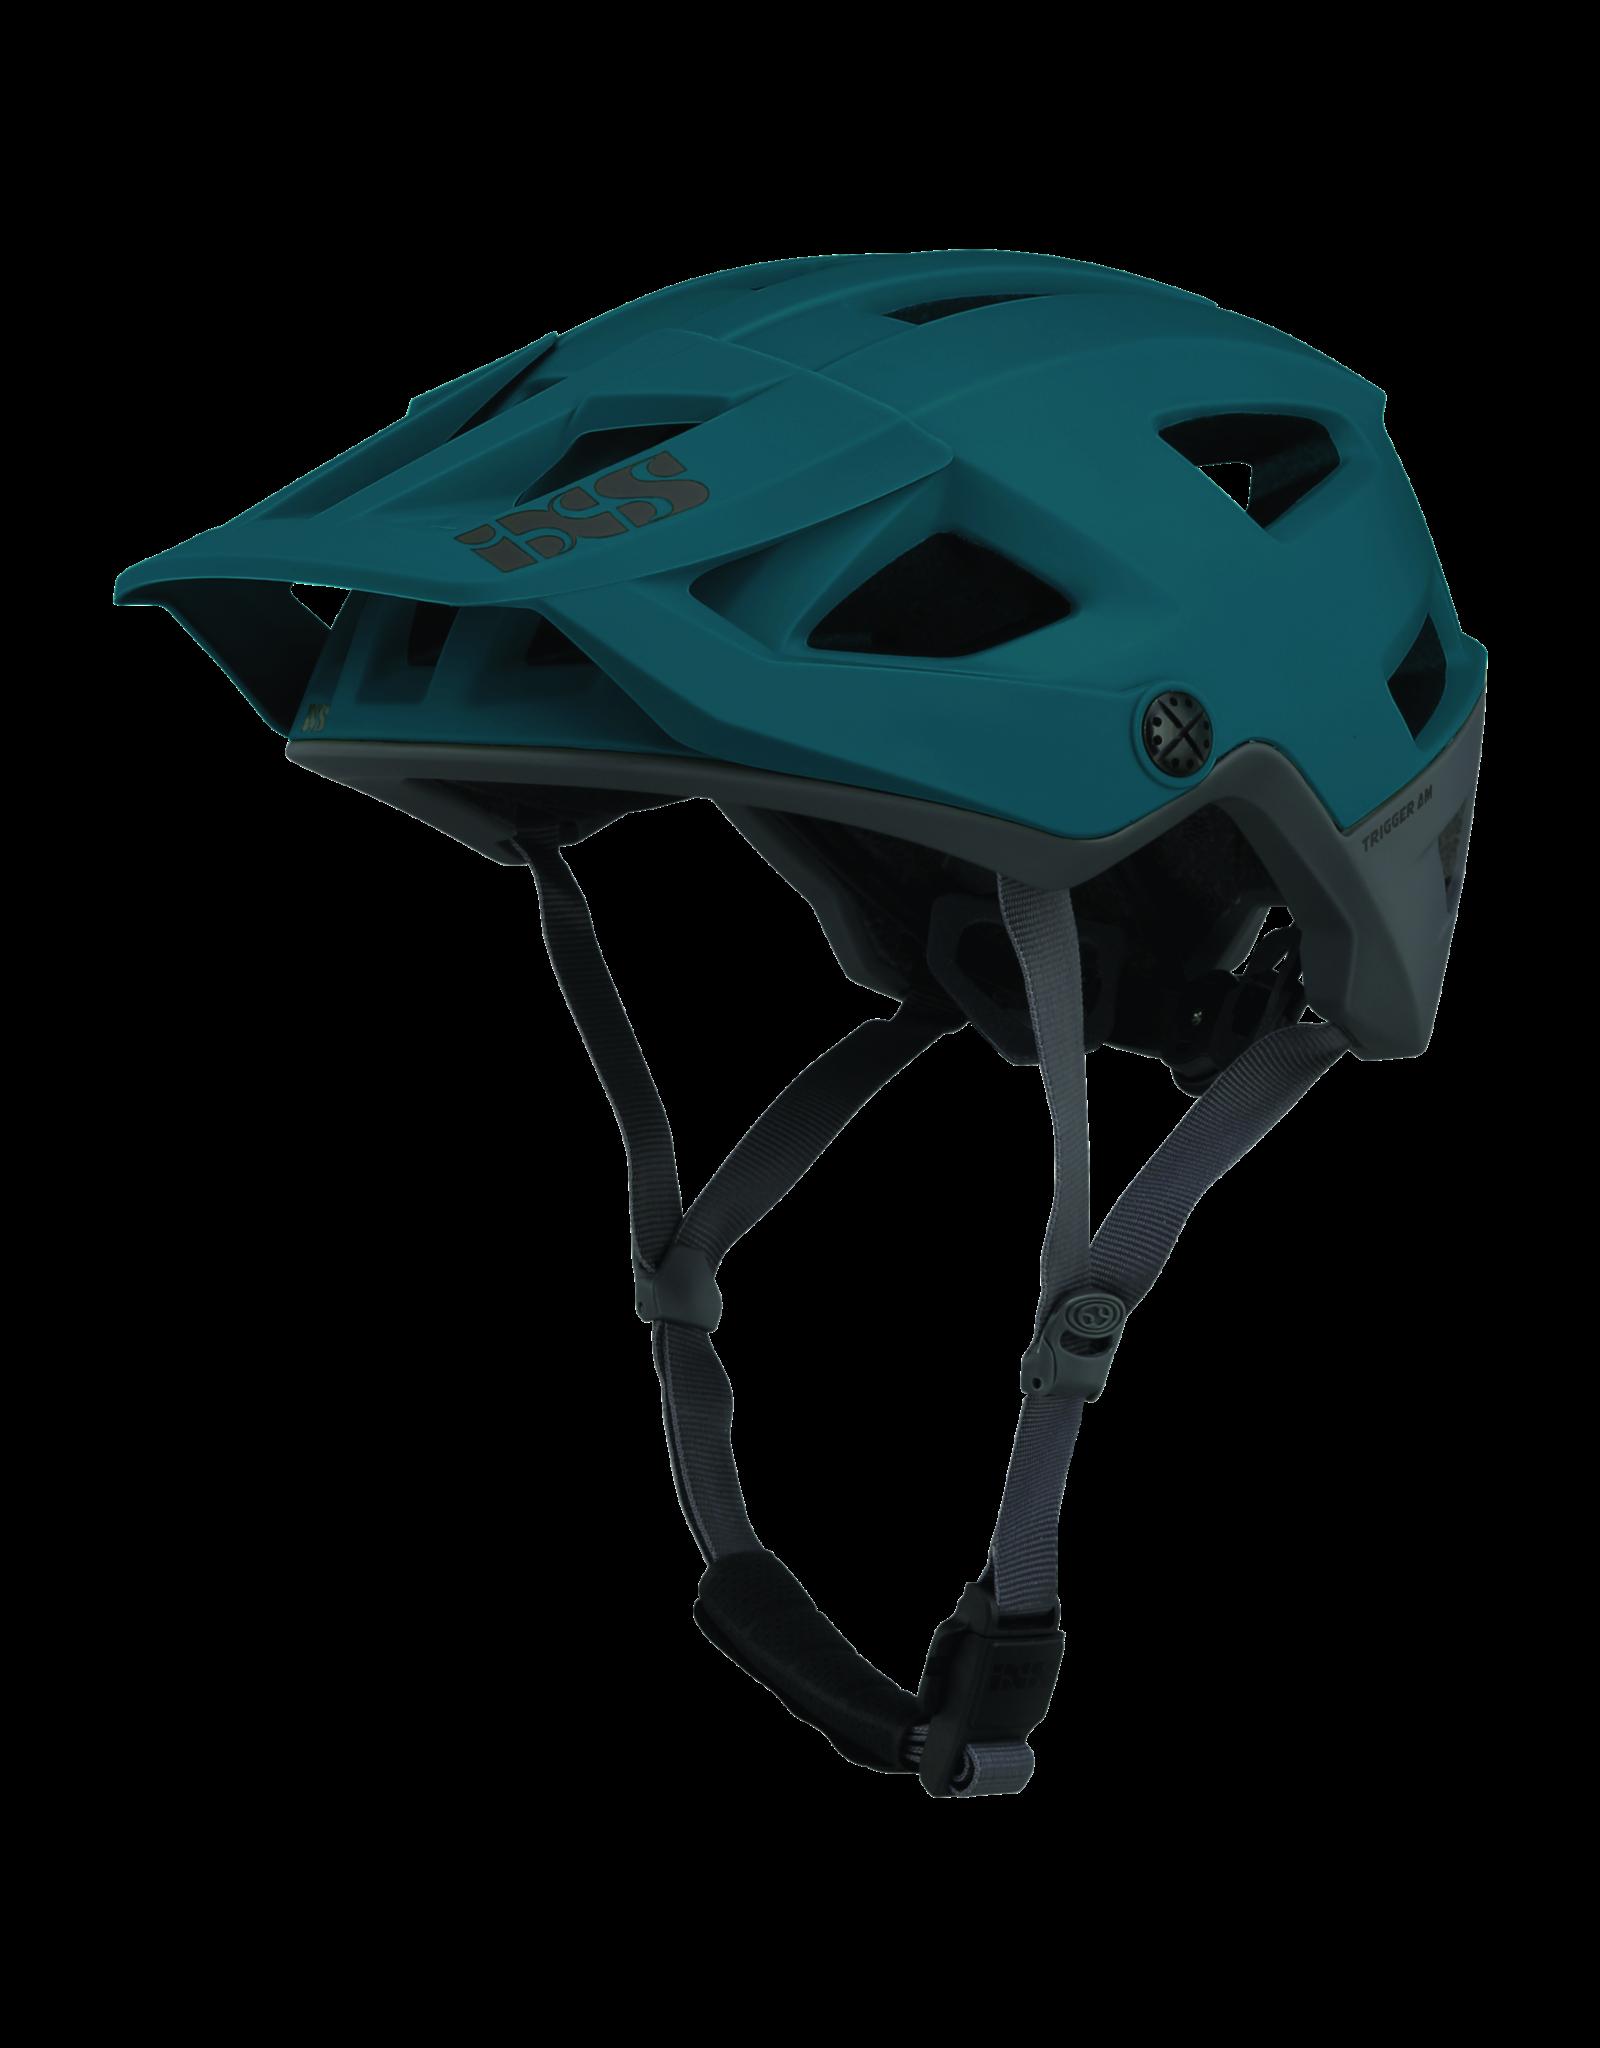 IXS IXS - Trigger AM Helmet Everglade S/M